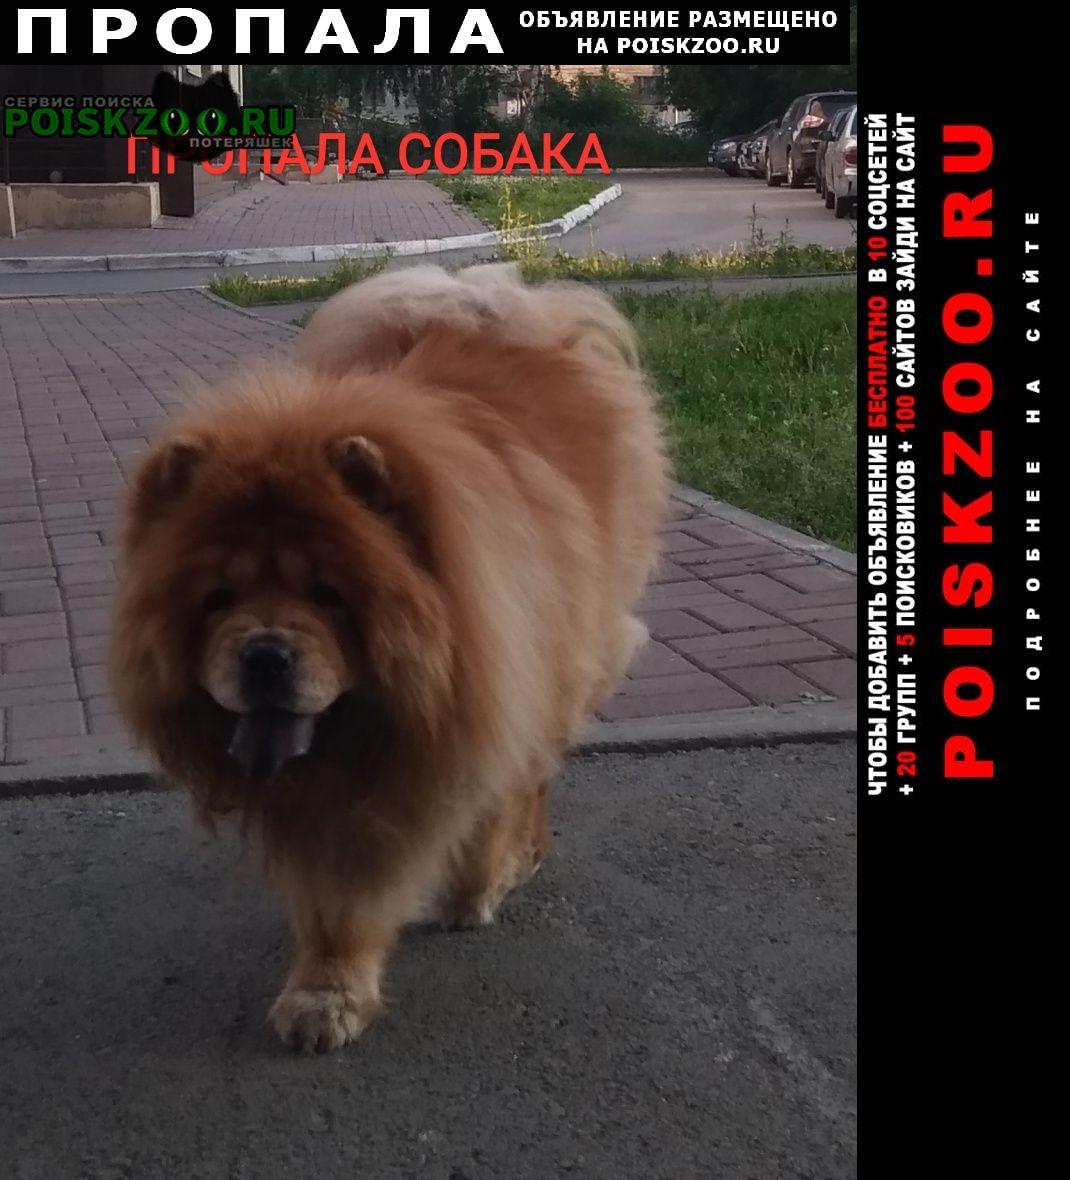 Пропала собака чау-чау алиса Новосибирск